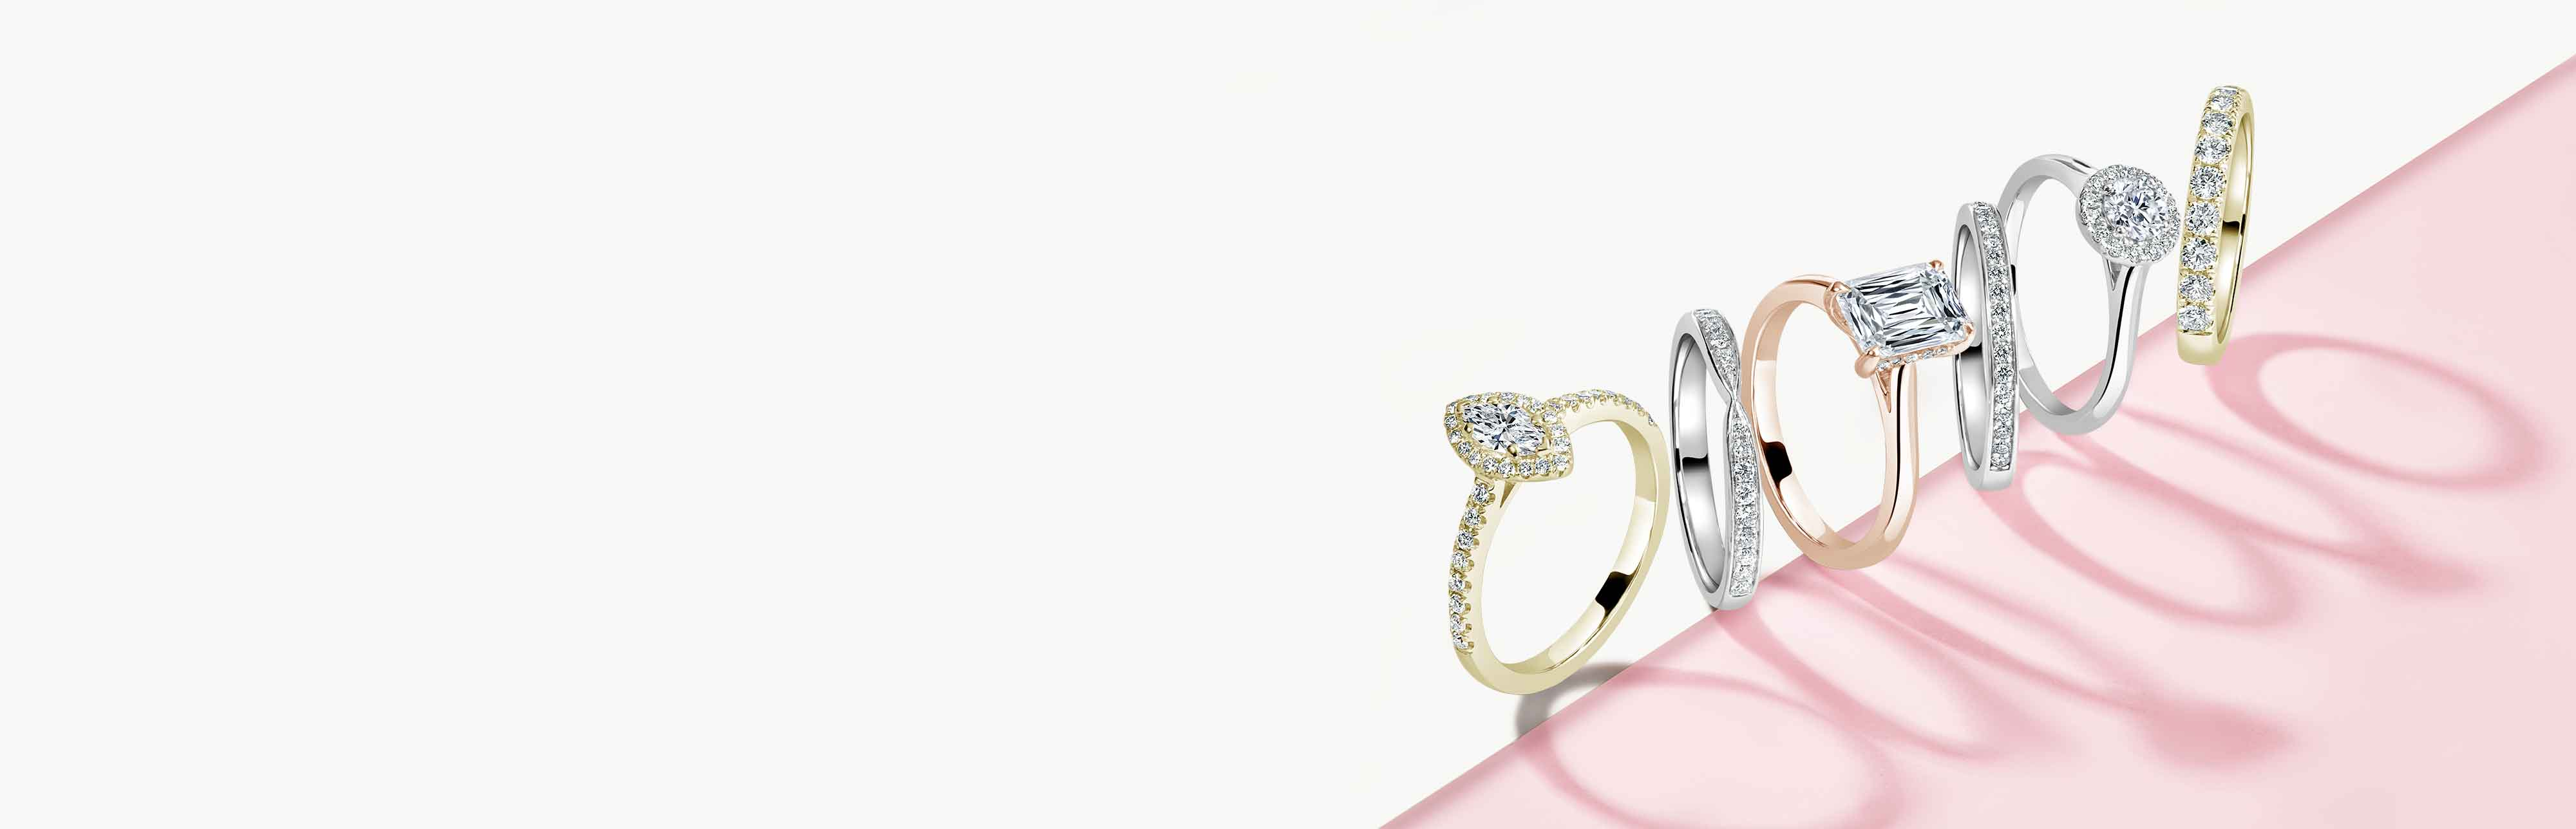 White Gold Oval Cut Engagement Rings - Steven Stone